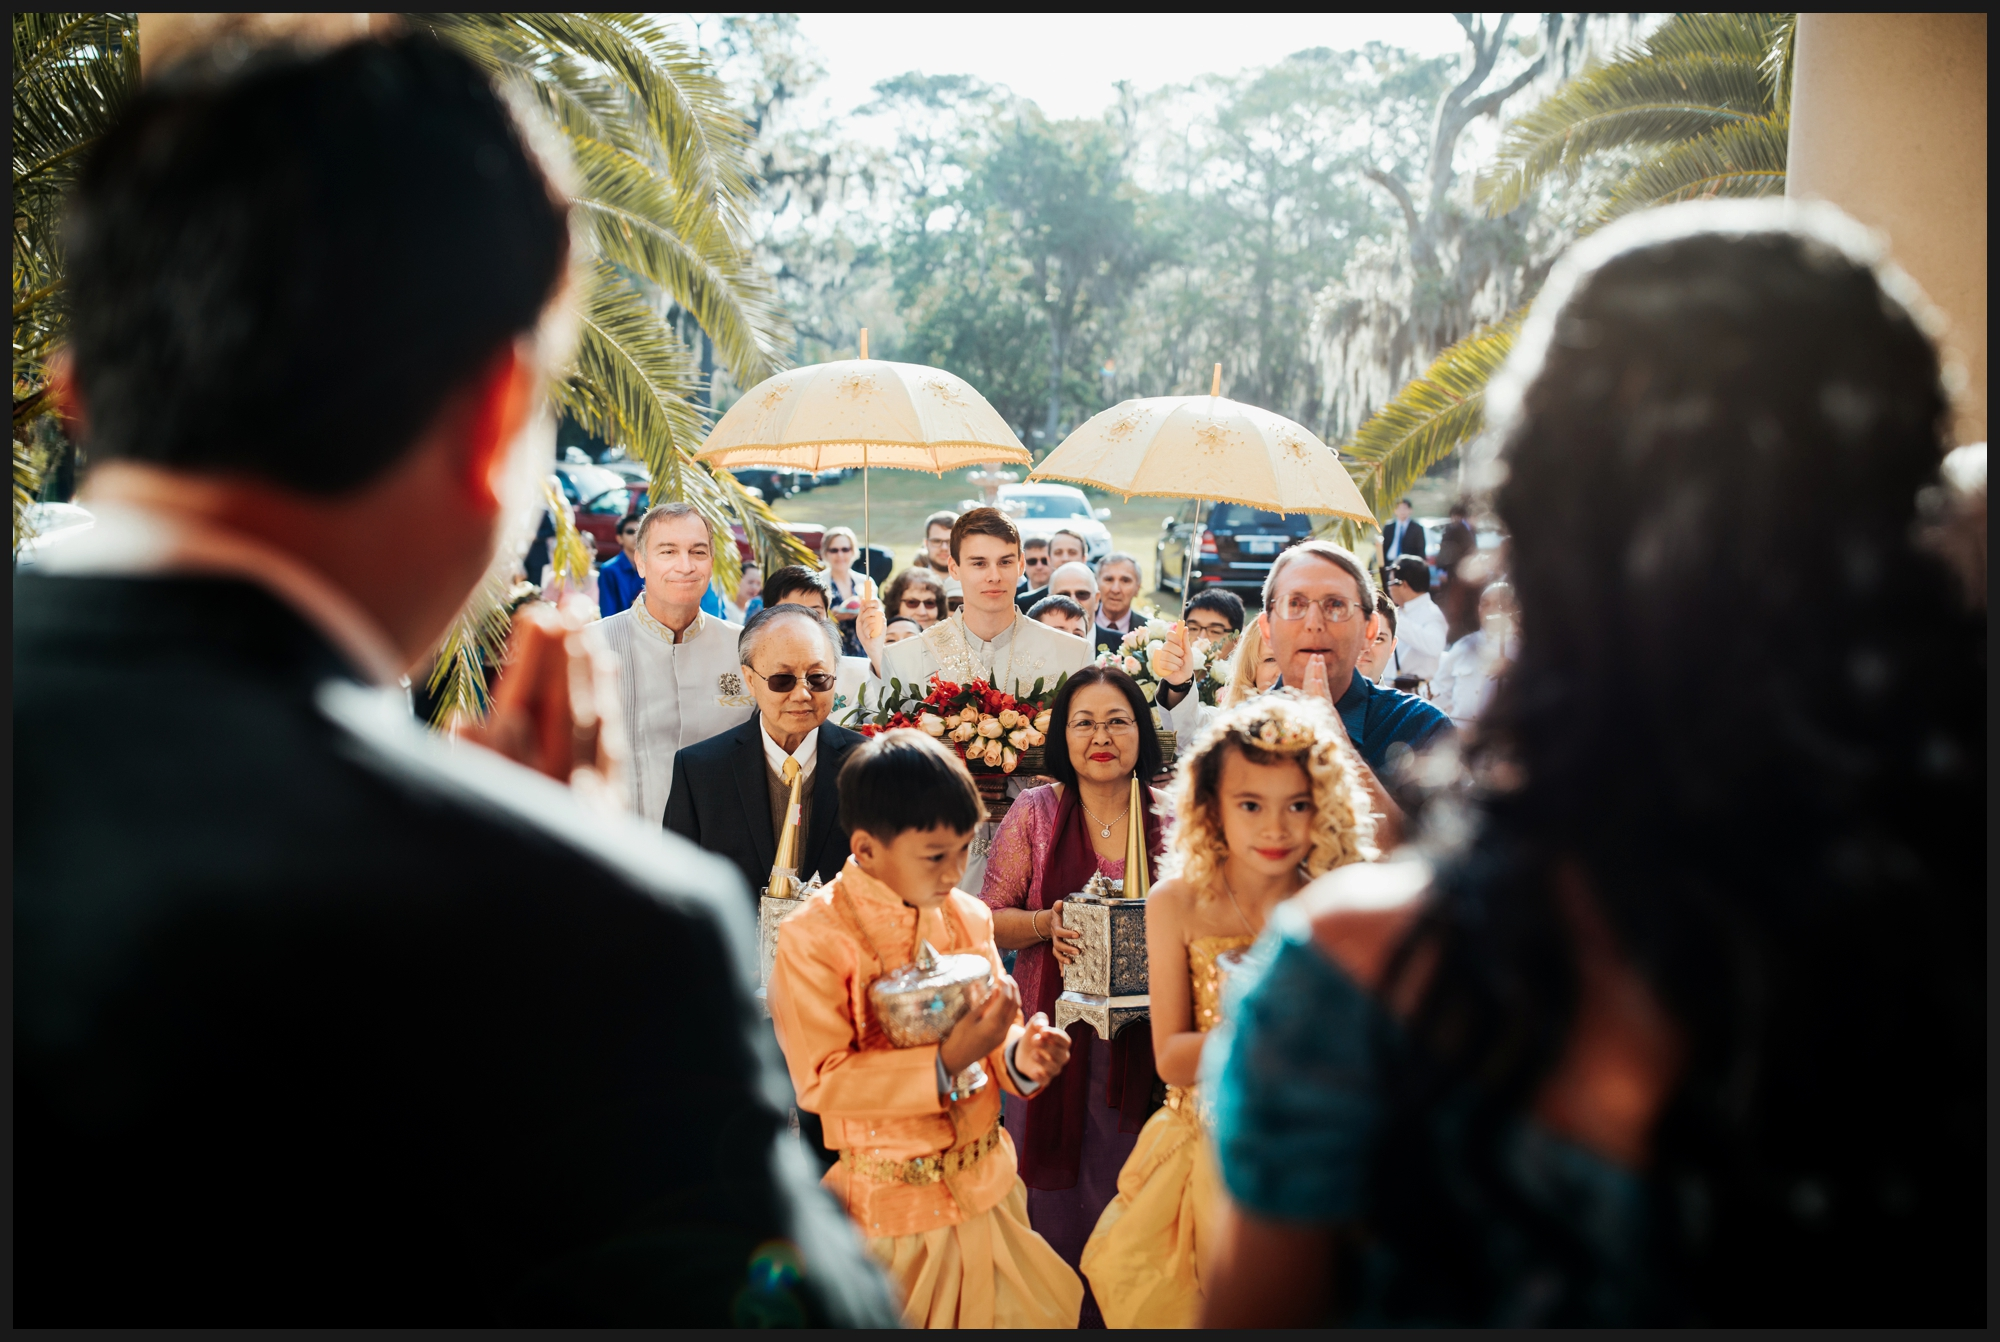 Orlando-Wedding-Photographer-destination-wedding-photographer-florida-wedding-photographer-bohemian-wedding-photographer_1366.jpg